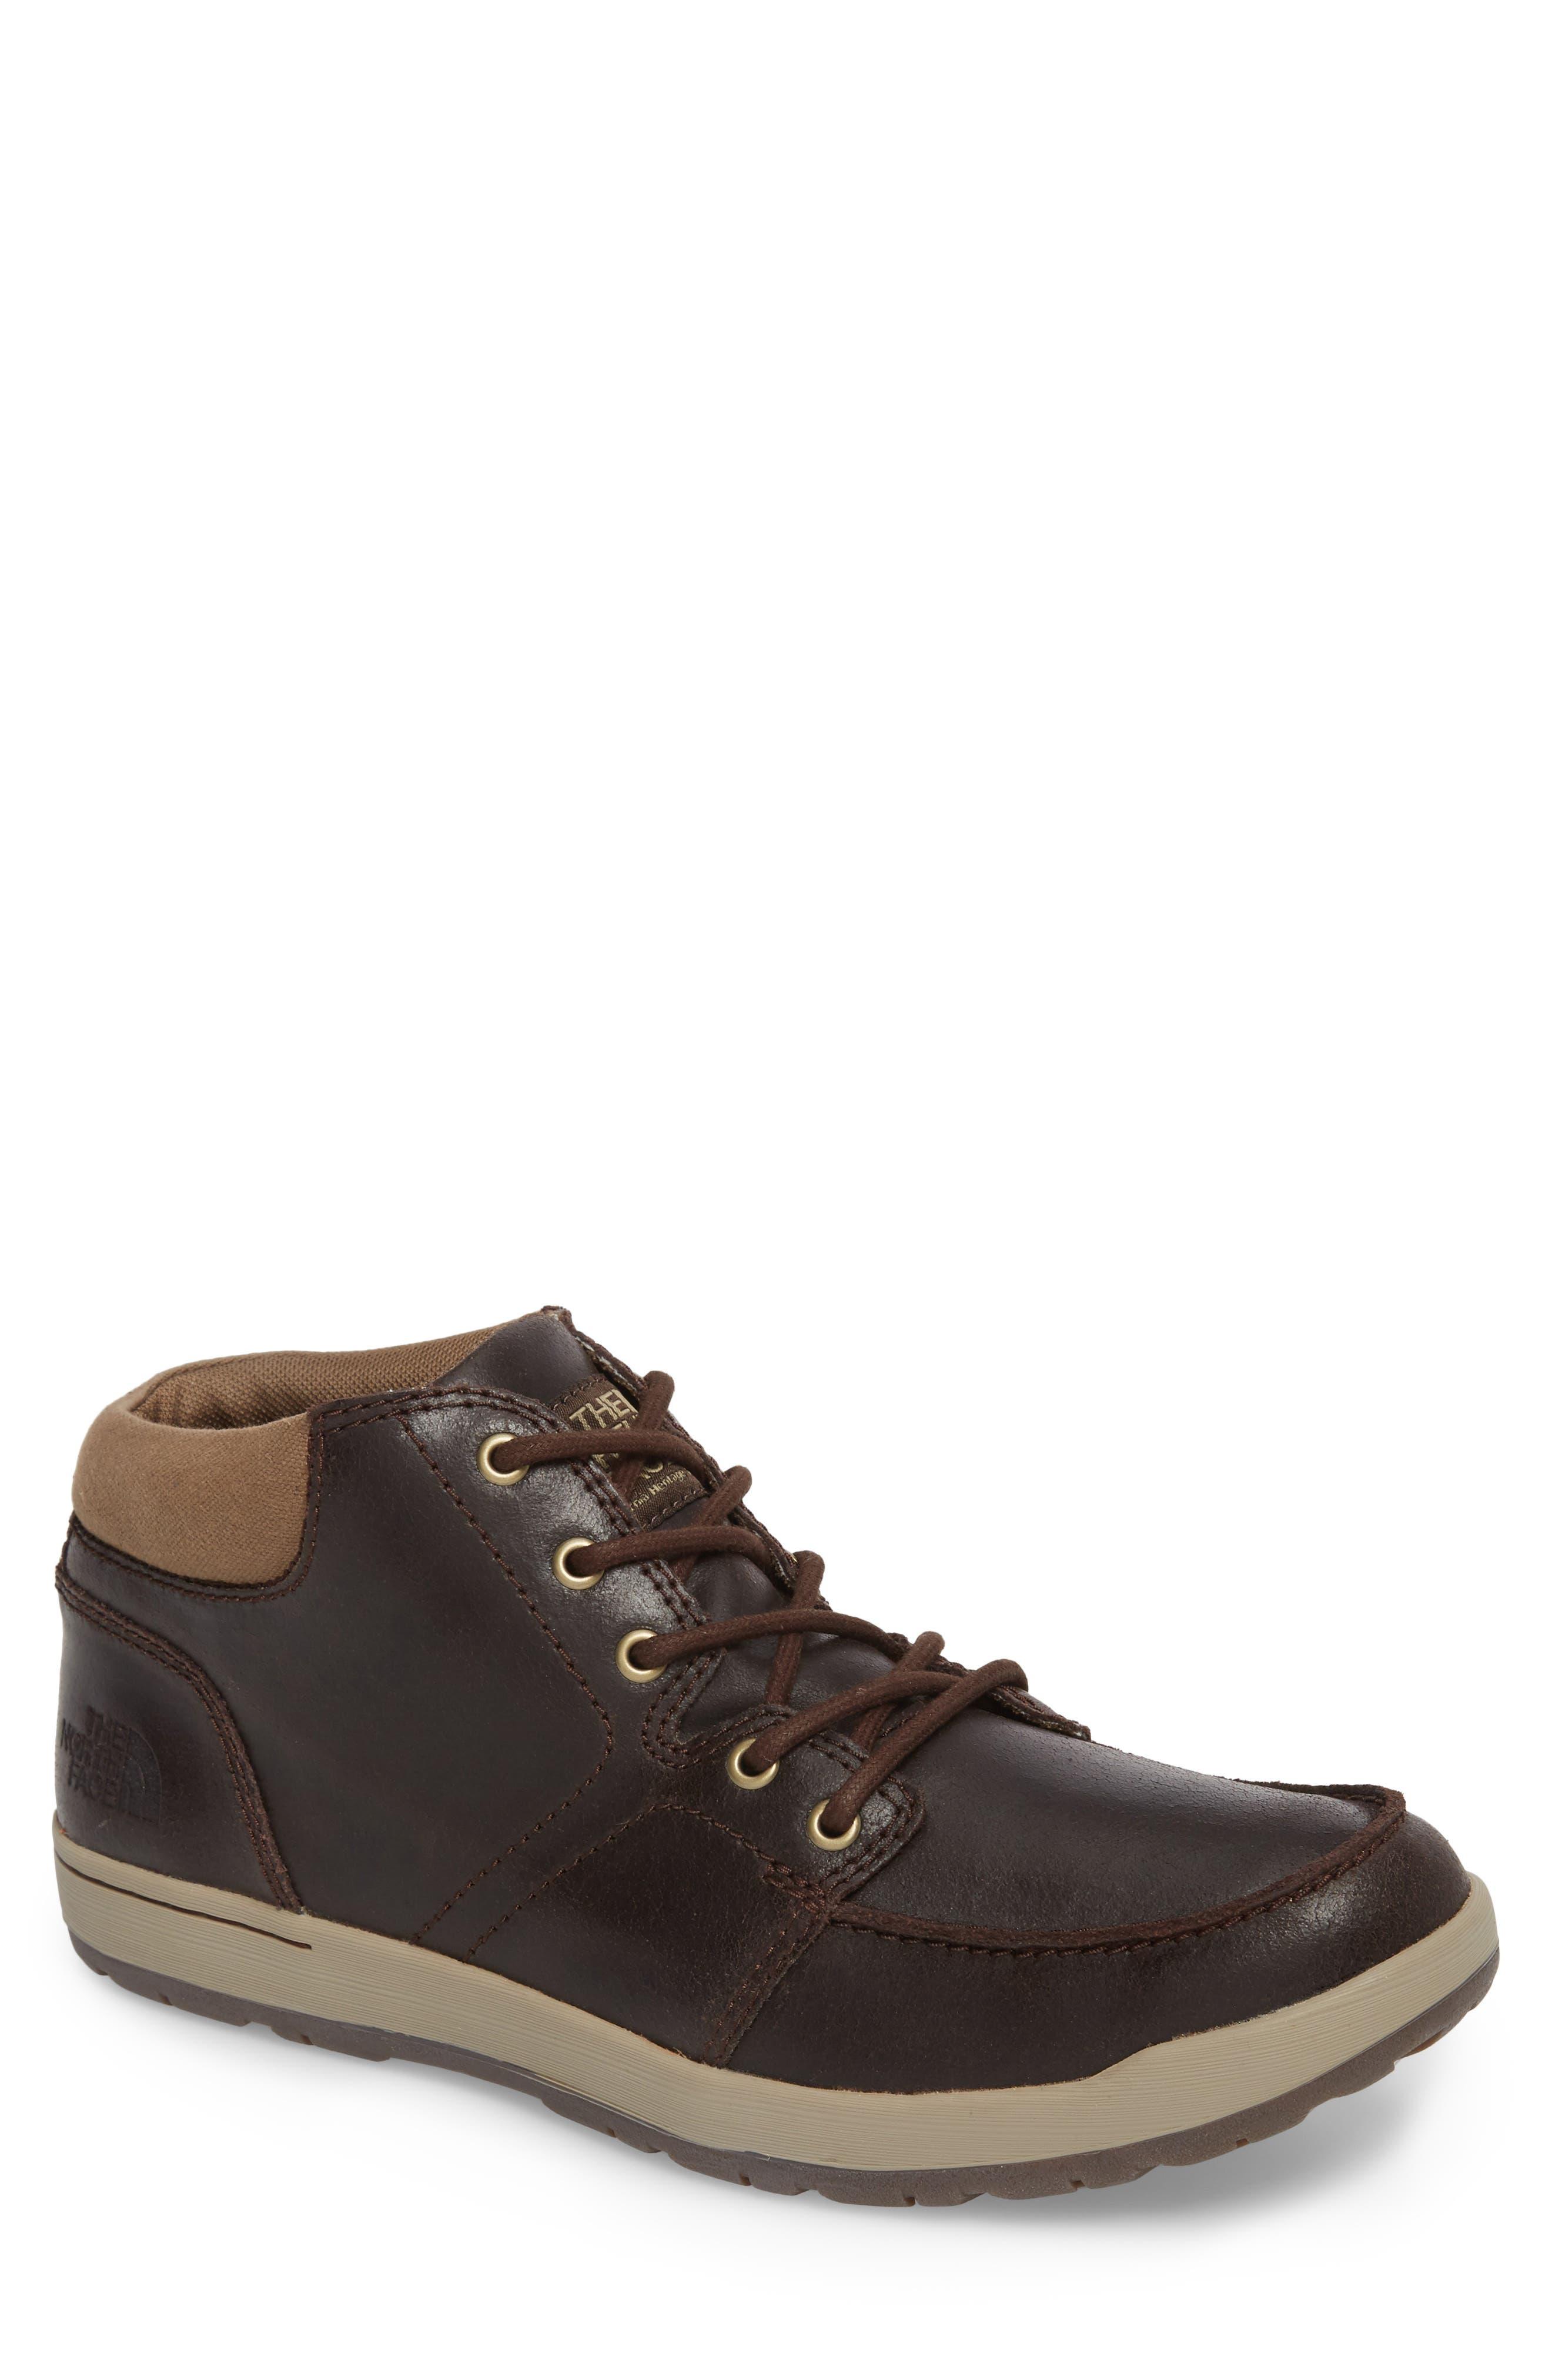 Alternate Image 1 Selected - The North Face Ballard Evo Moc Toe Boot (Men)